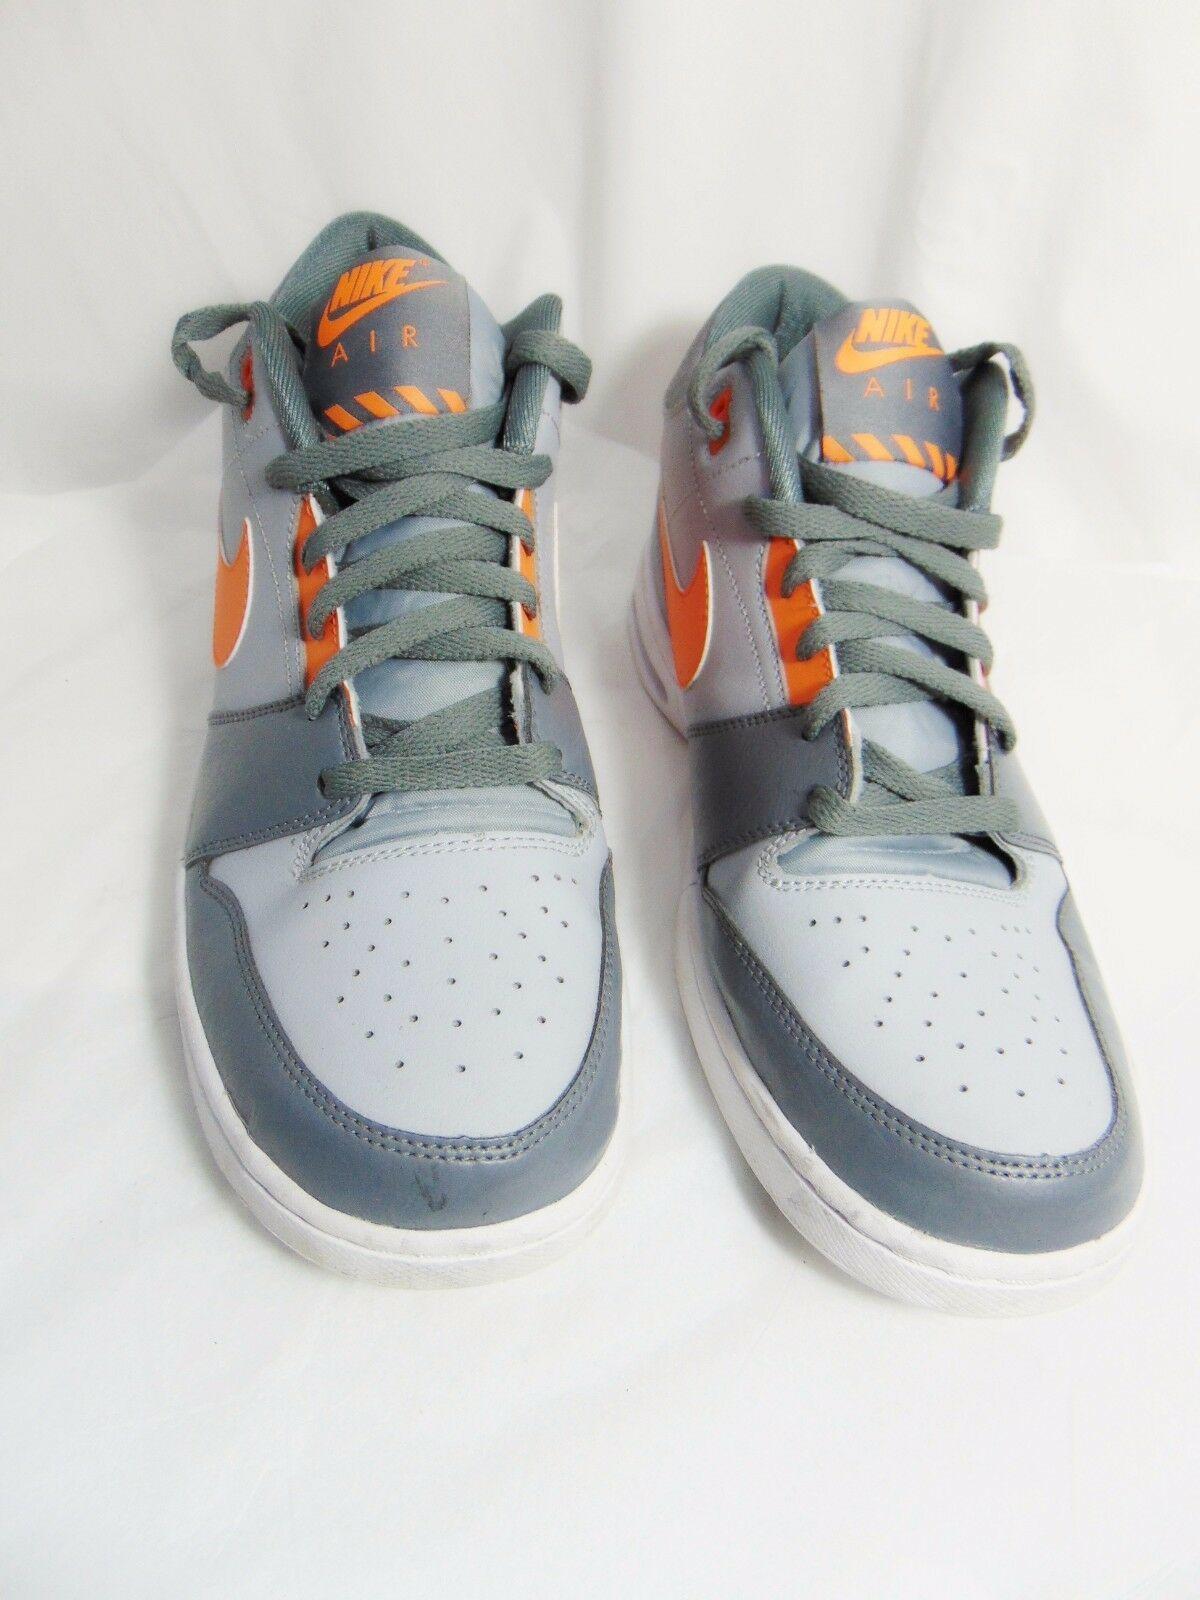 NIKE Air Stepback Men's Athletic Shoes Sneakers 11.5 M Gray Orange 654476 080